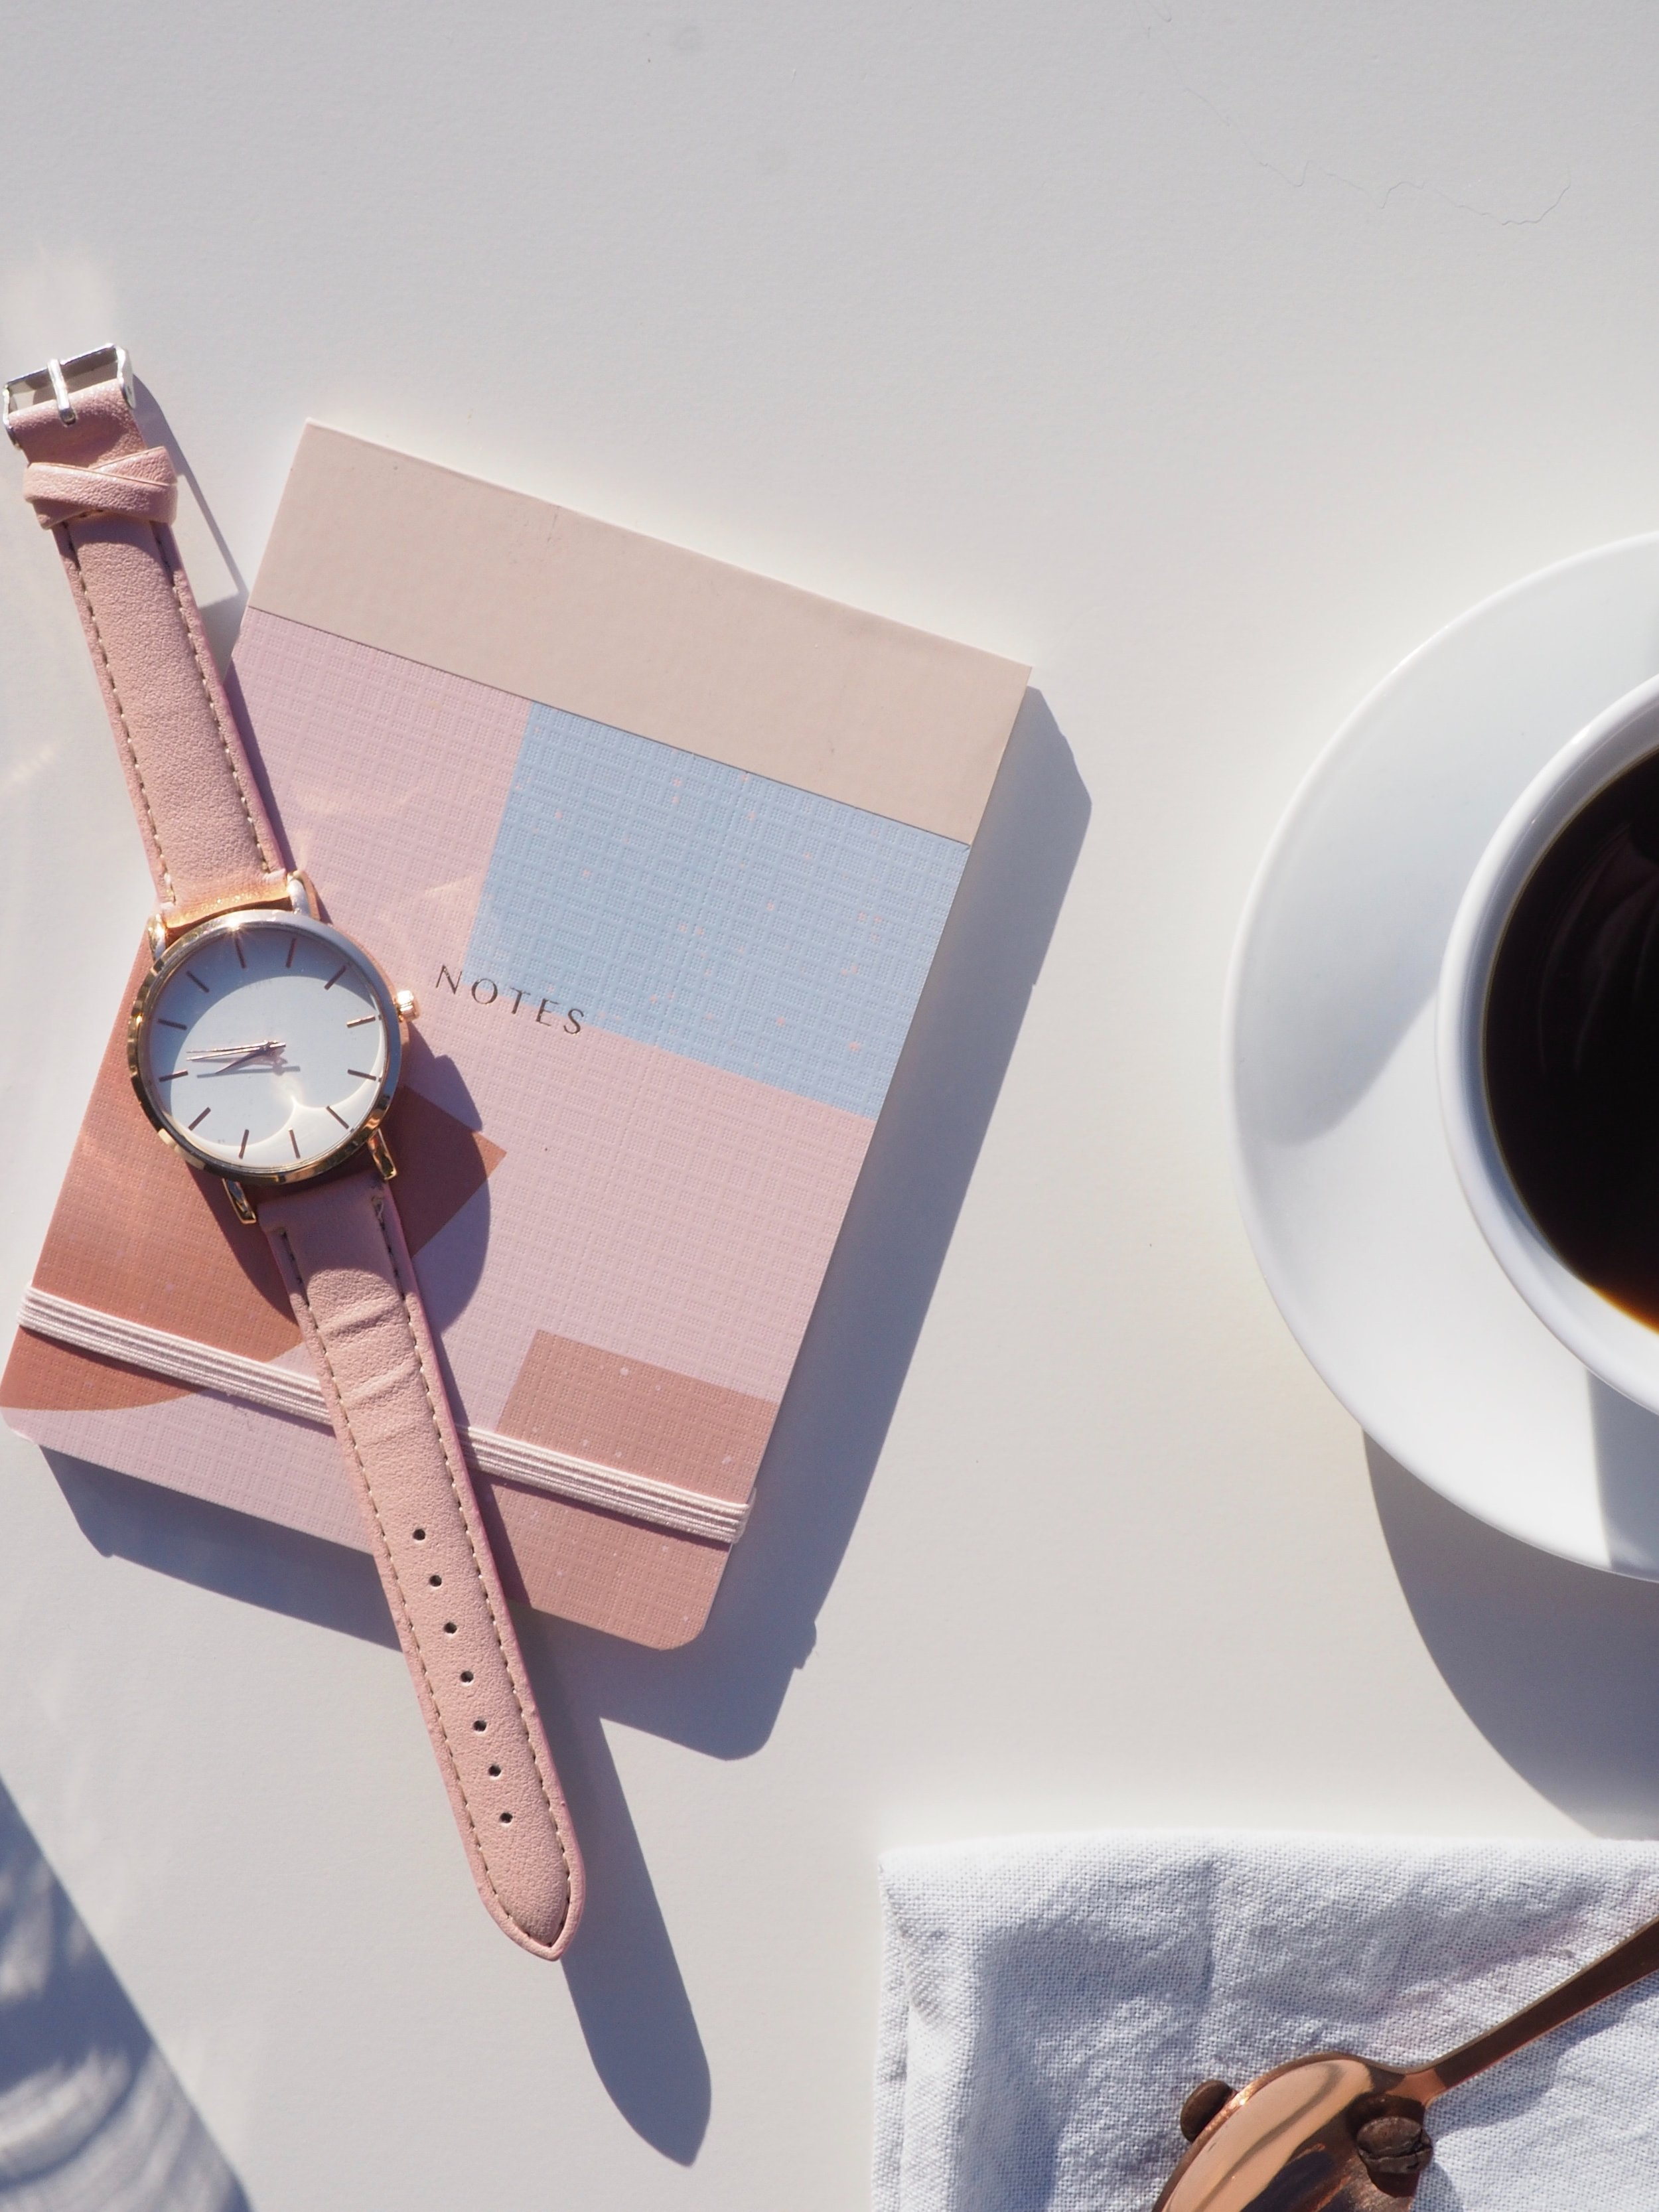 analog-watch-background-close-up-1162519.jpg